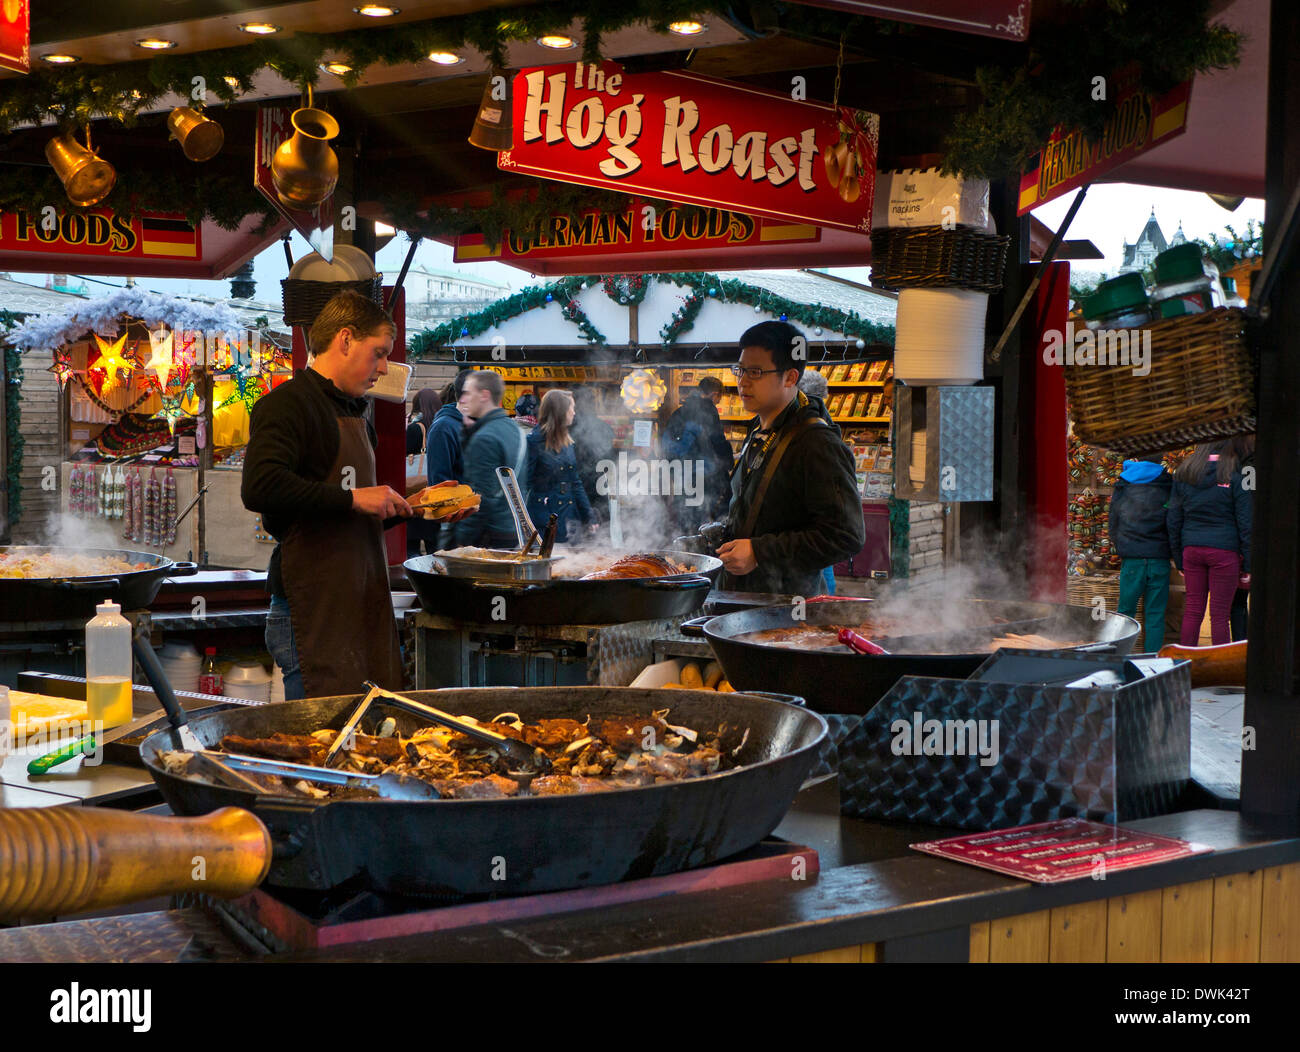 SouthBank German Christmas market takeaway hog roast food stall and visitors London UK - Stock Image